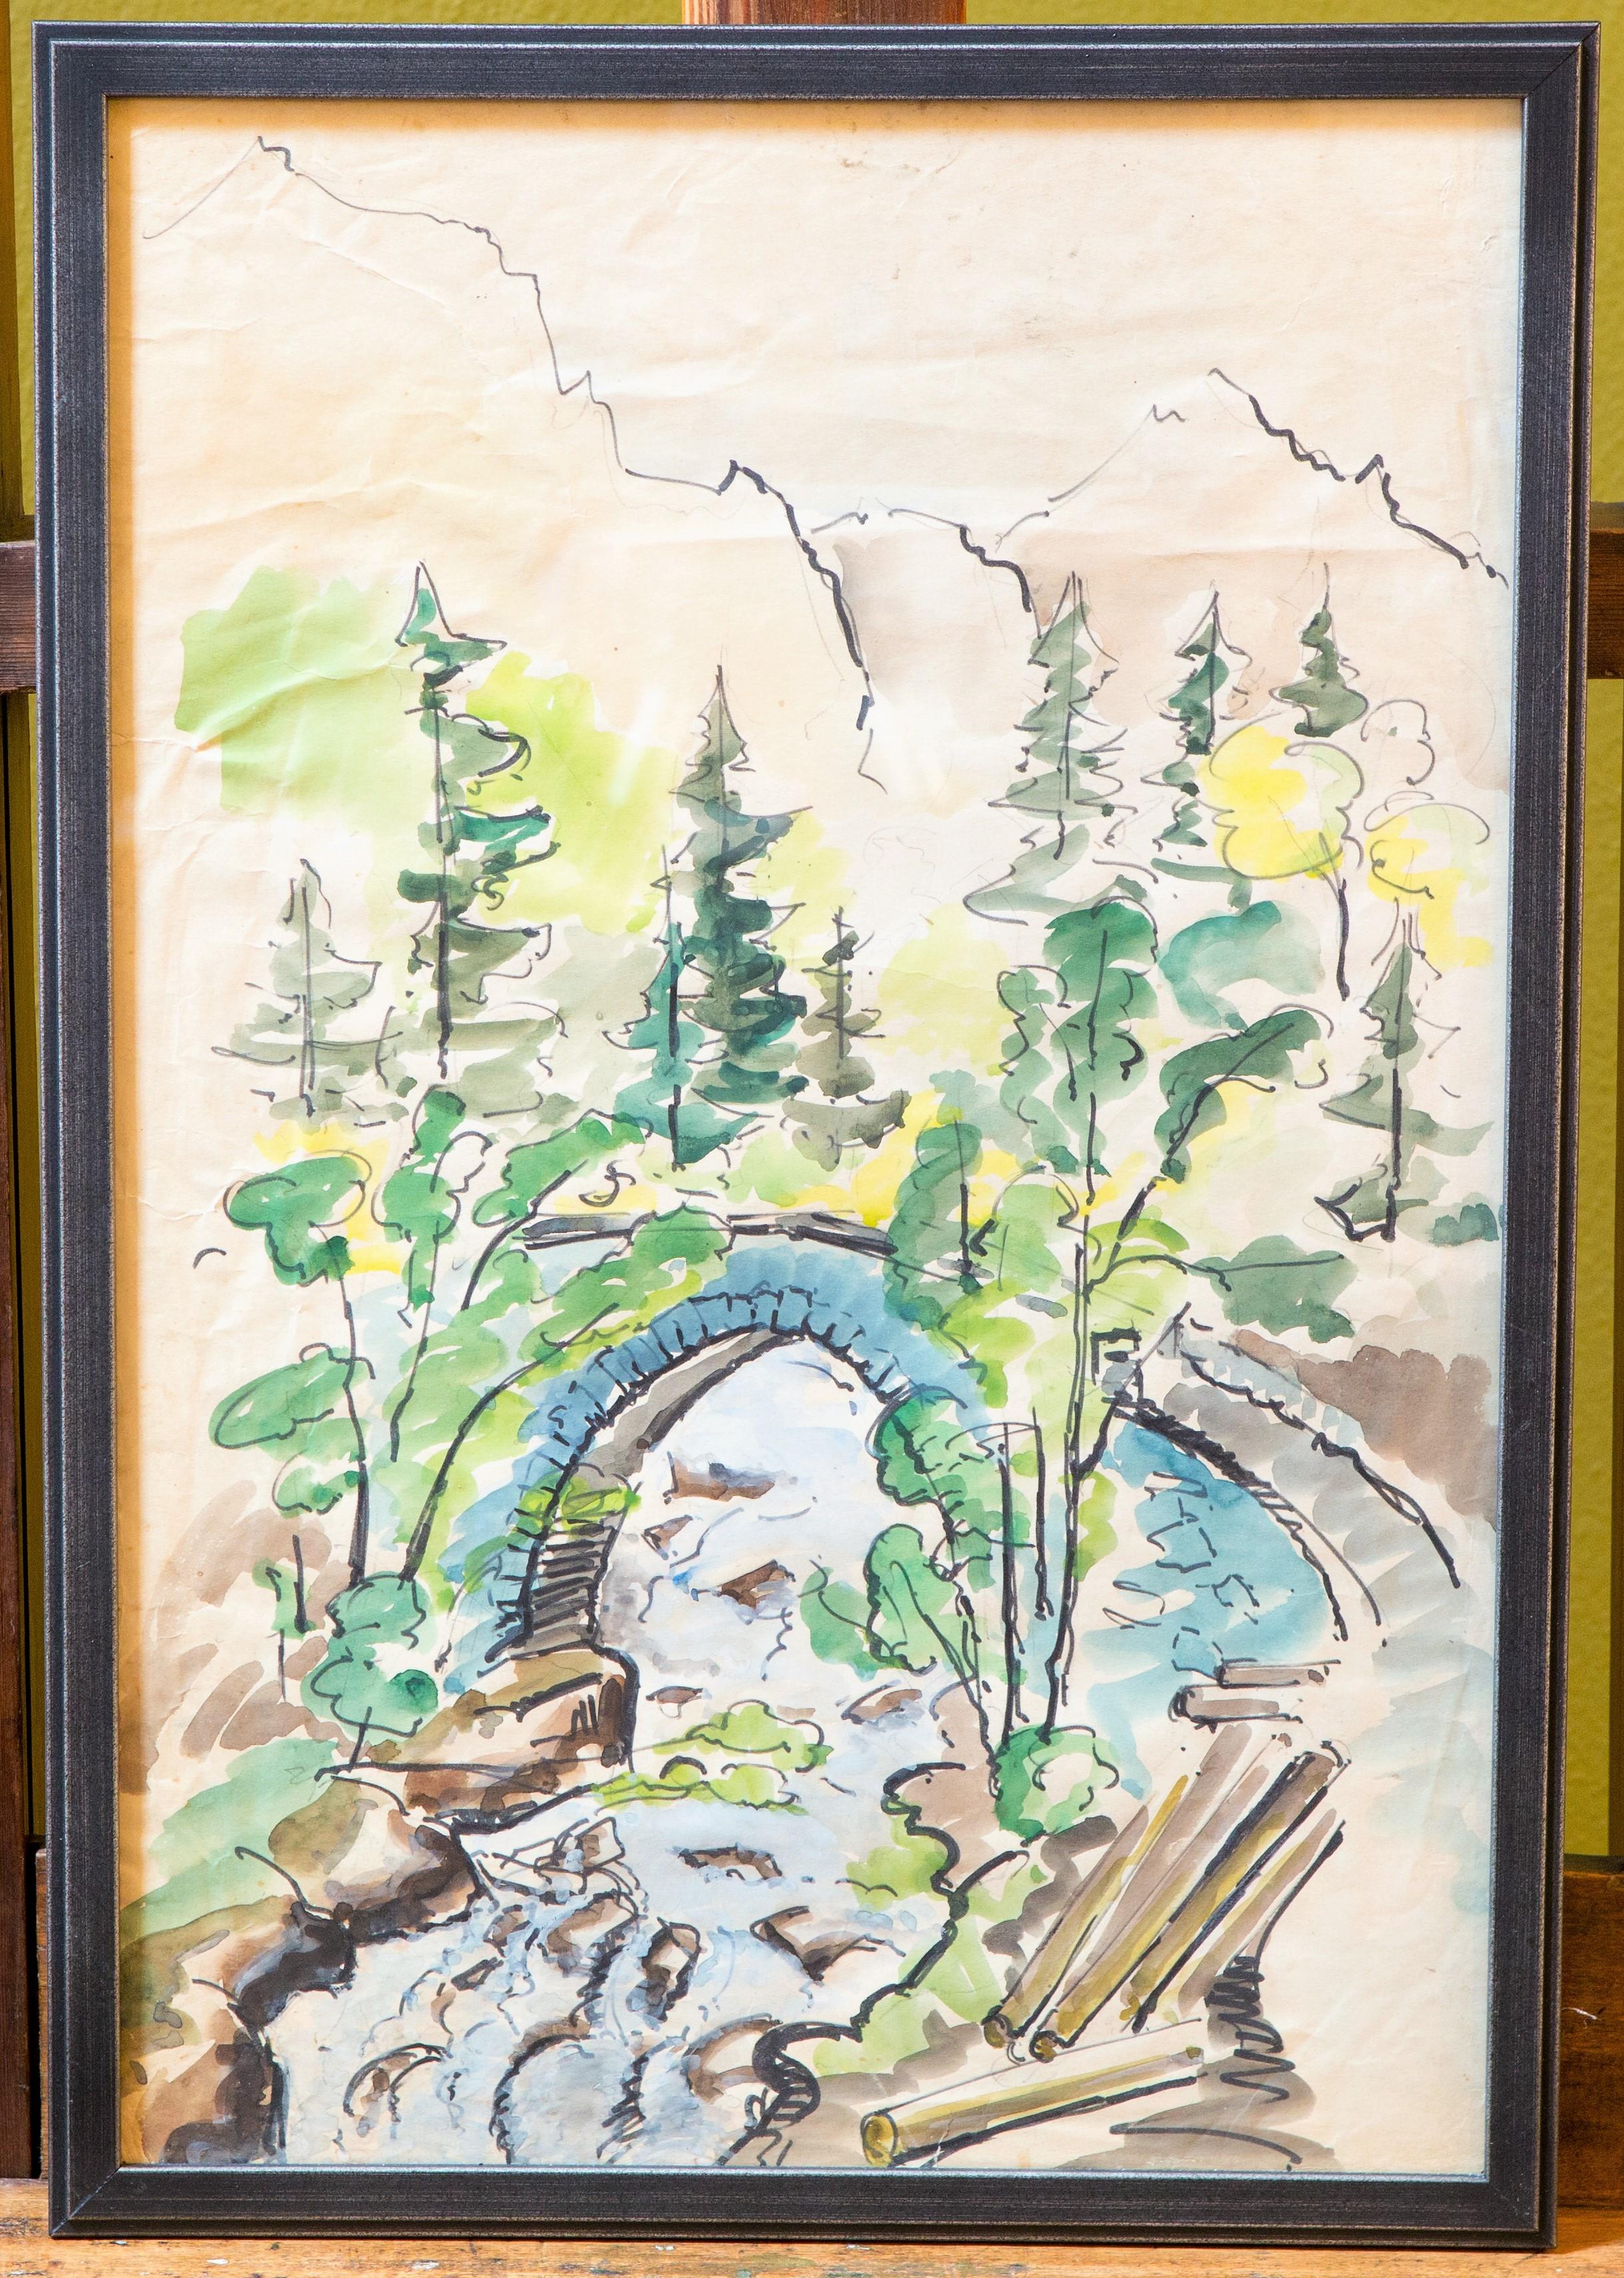 Watercolor with Bridge